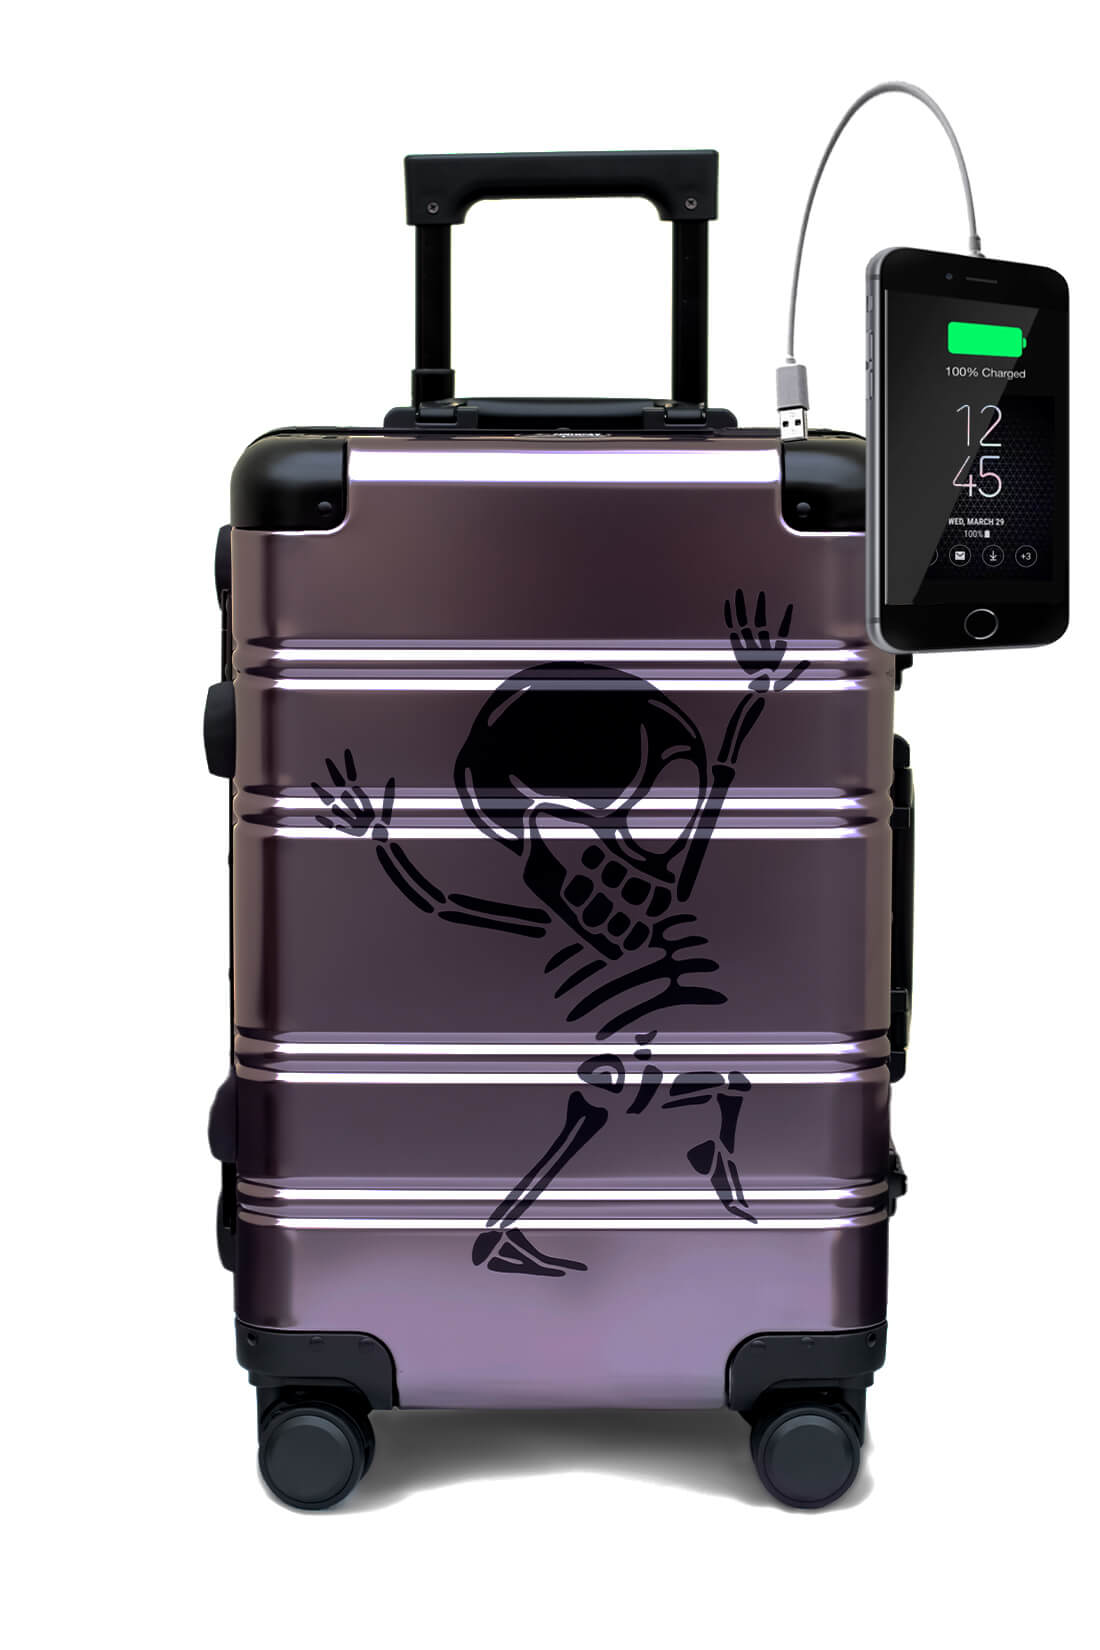 Aluminium Valise Online Cabine Trolley TOKYOTO LUGGAGE Modelle Money Heist 4